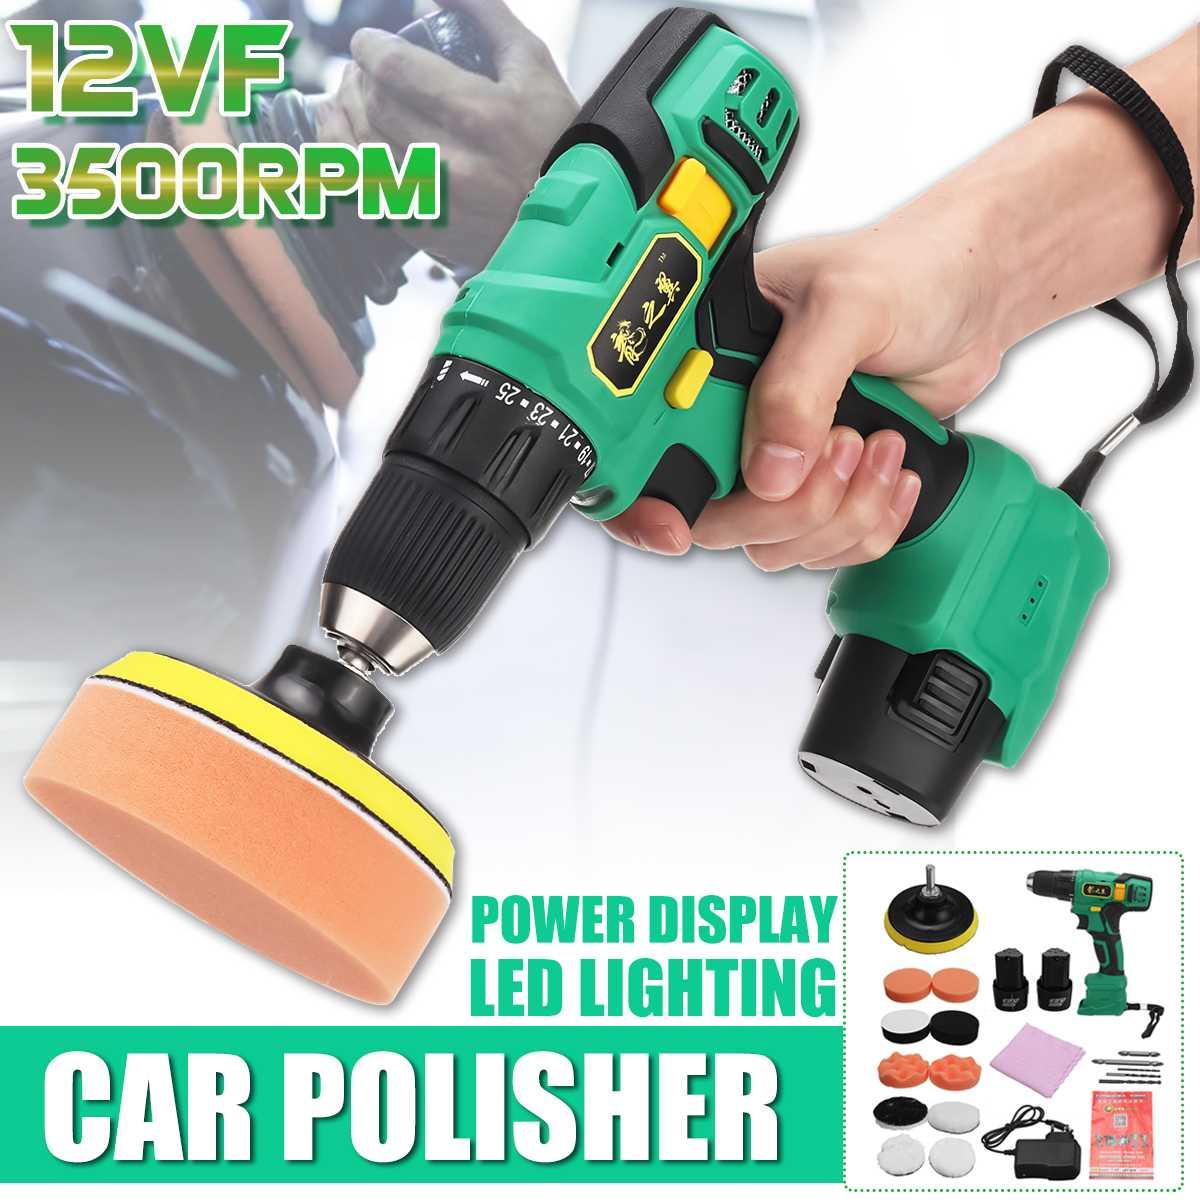 new-800w-cordless-car-polisher-3-5p-car-polishing-machine-power-grinder-3500rpm-polishing-machine-w-battery-and-sanding-tool